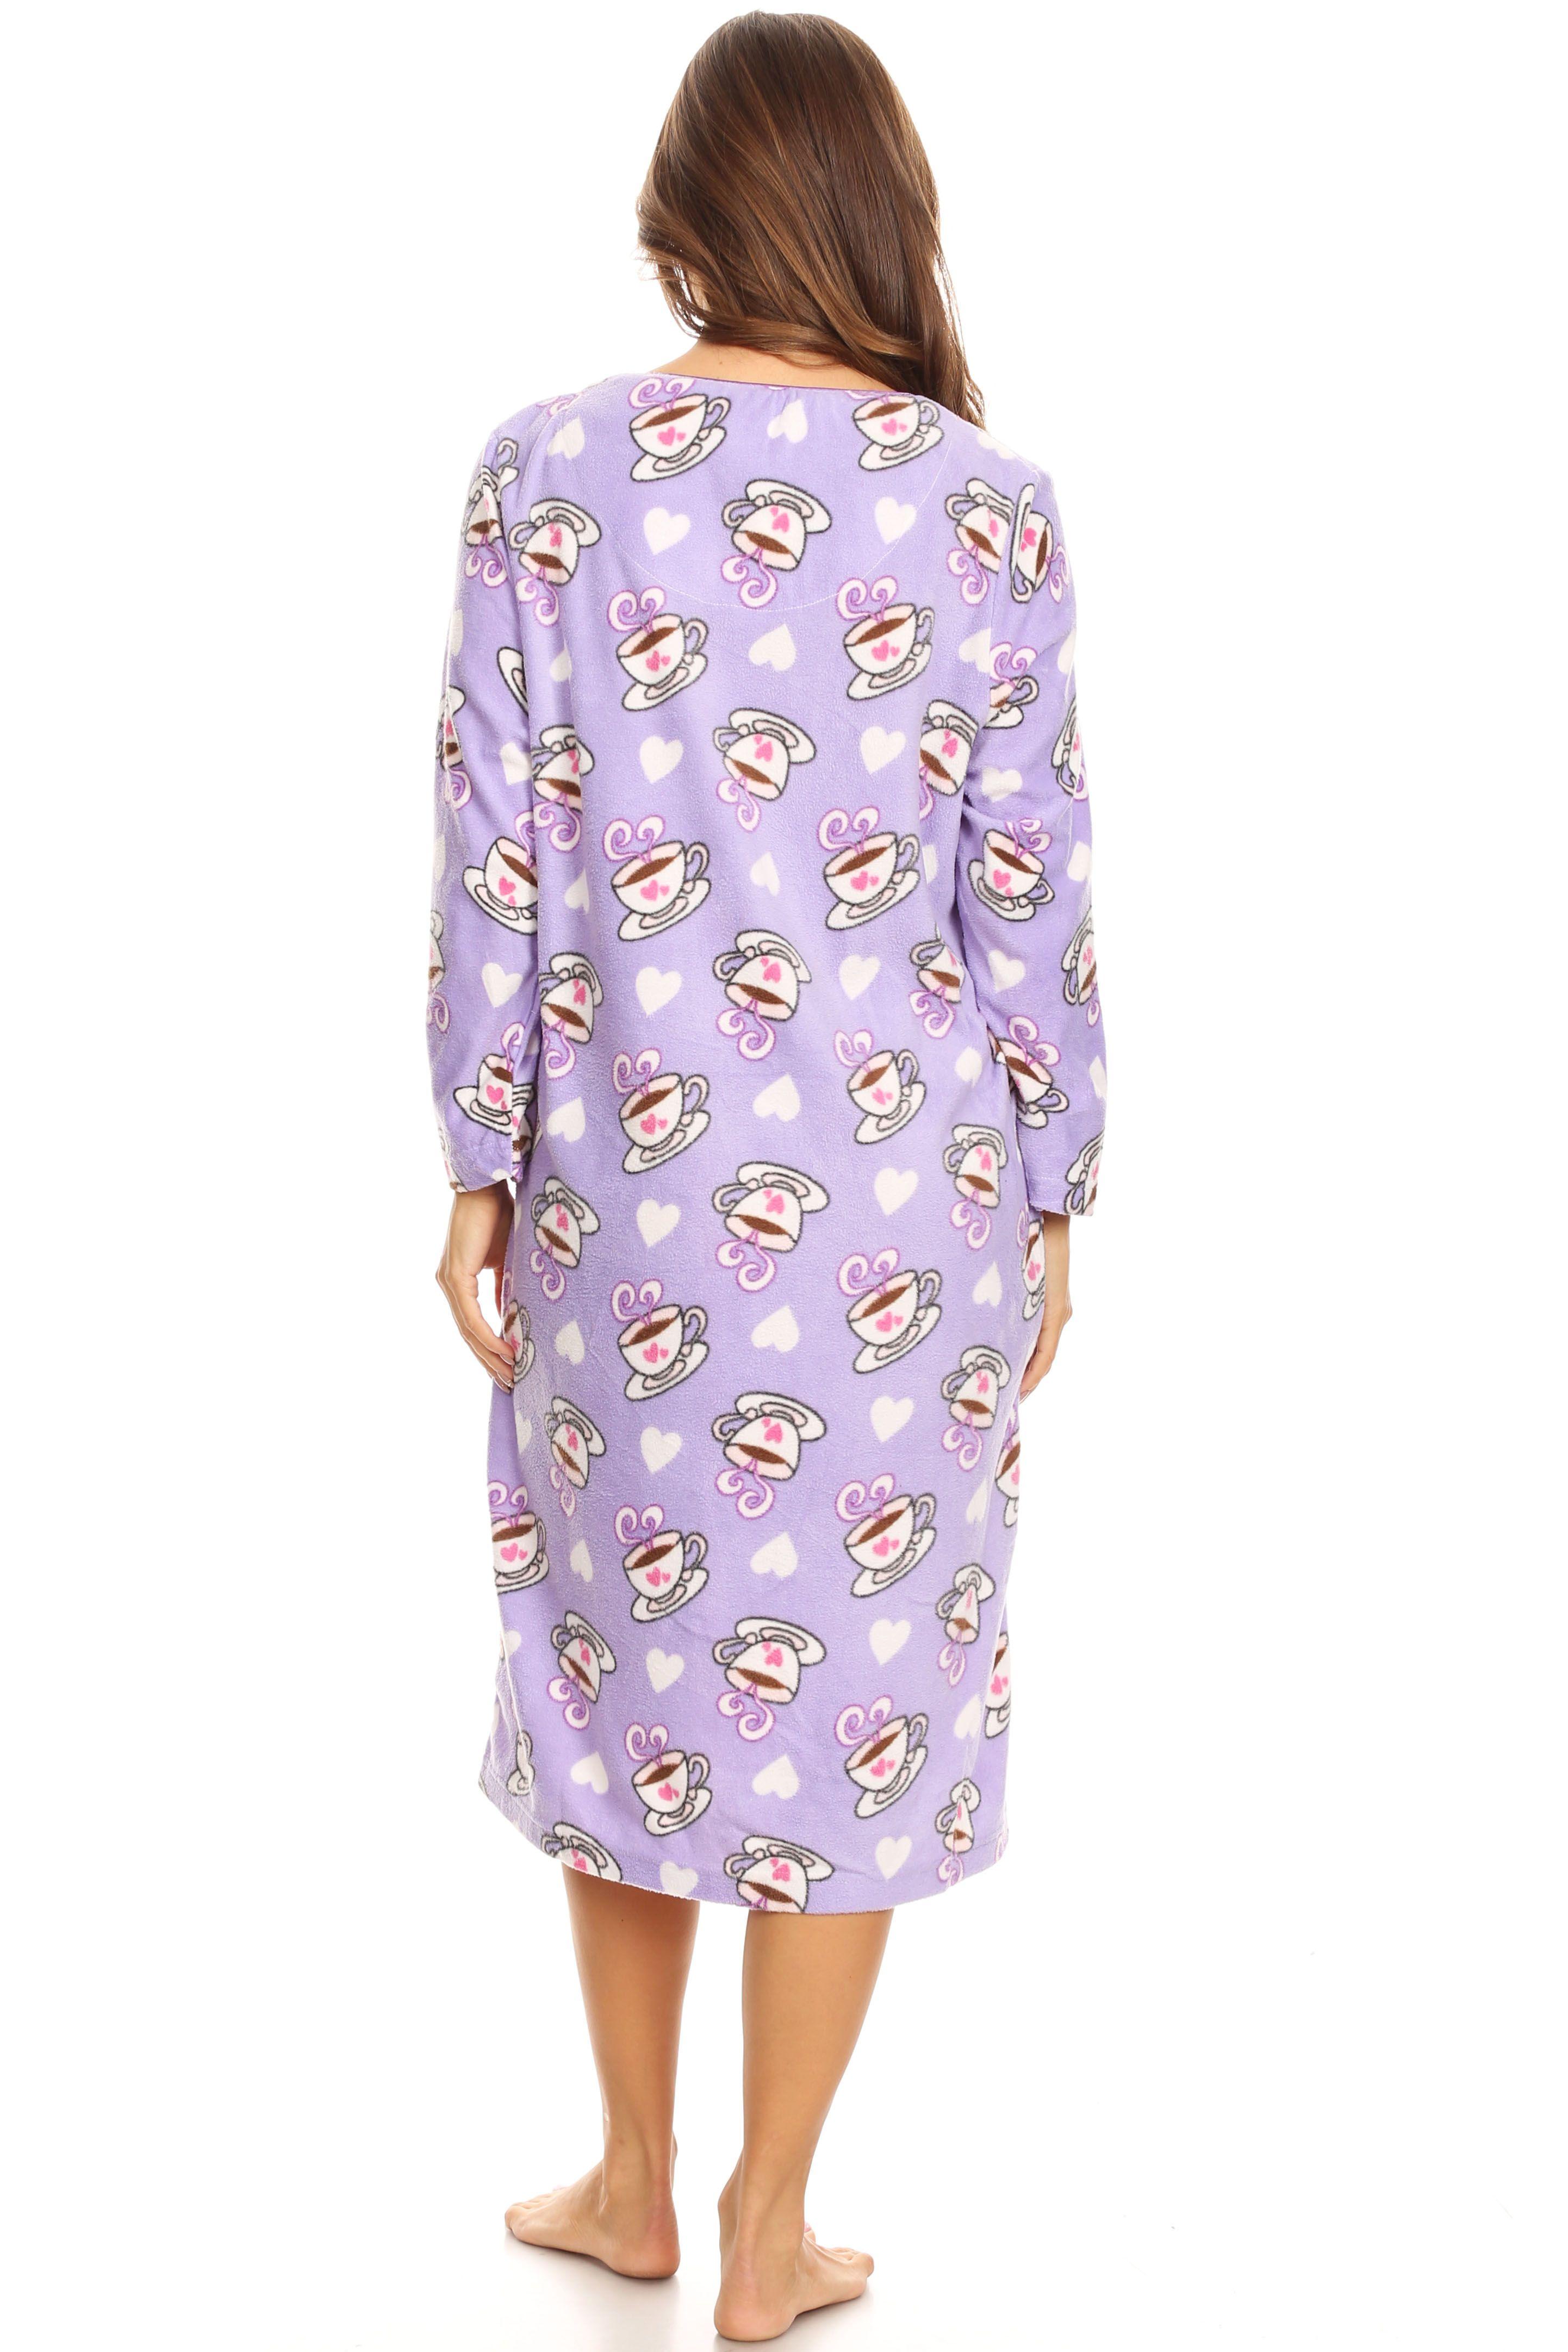 Premiere Fashion 14045 Fleece Womens Nightgown Sleepwear Pajamas Woman Long Sleeve Sleep Dress Nightshirt Purple L Walmart Com Nightgowns For Women Pajamas Women Women Long Sleeve [ 4326 x 2884 Pixel ]